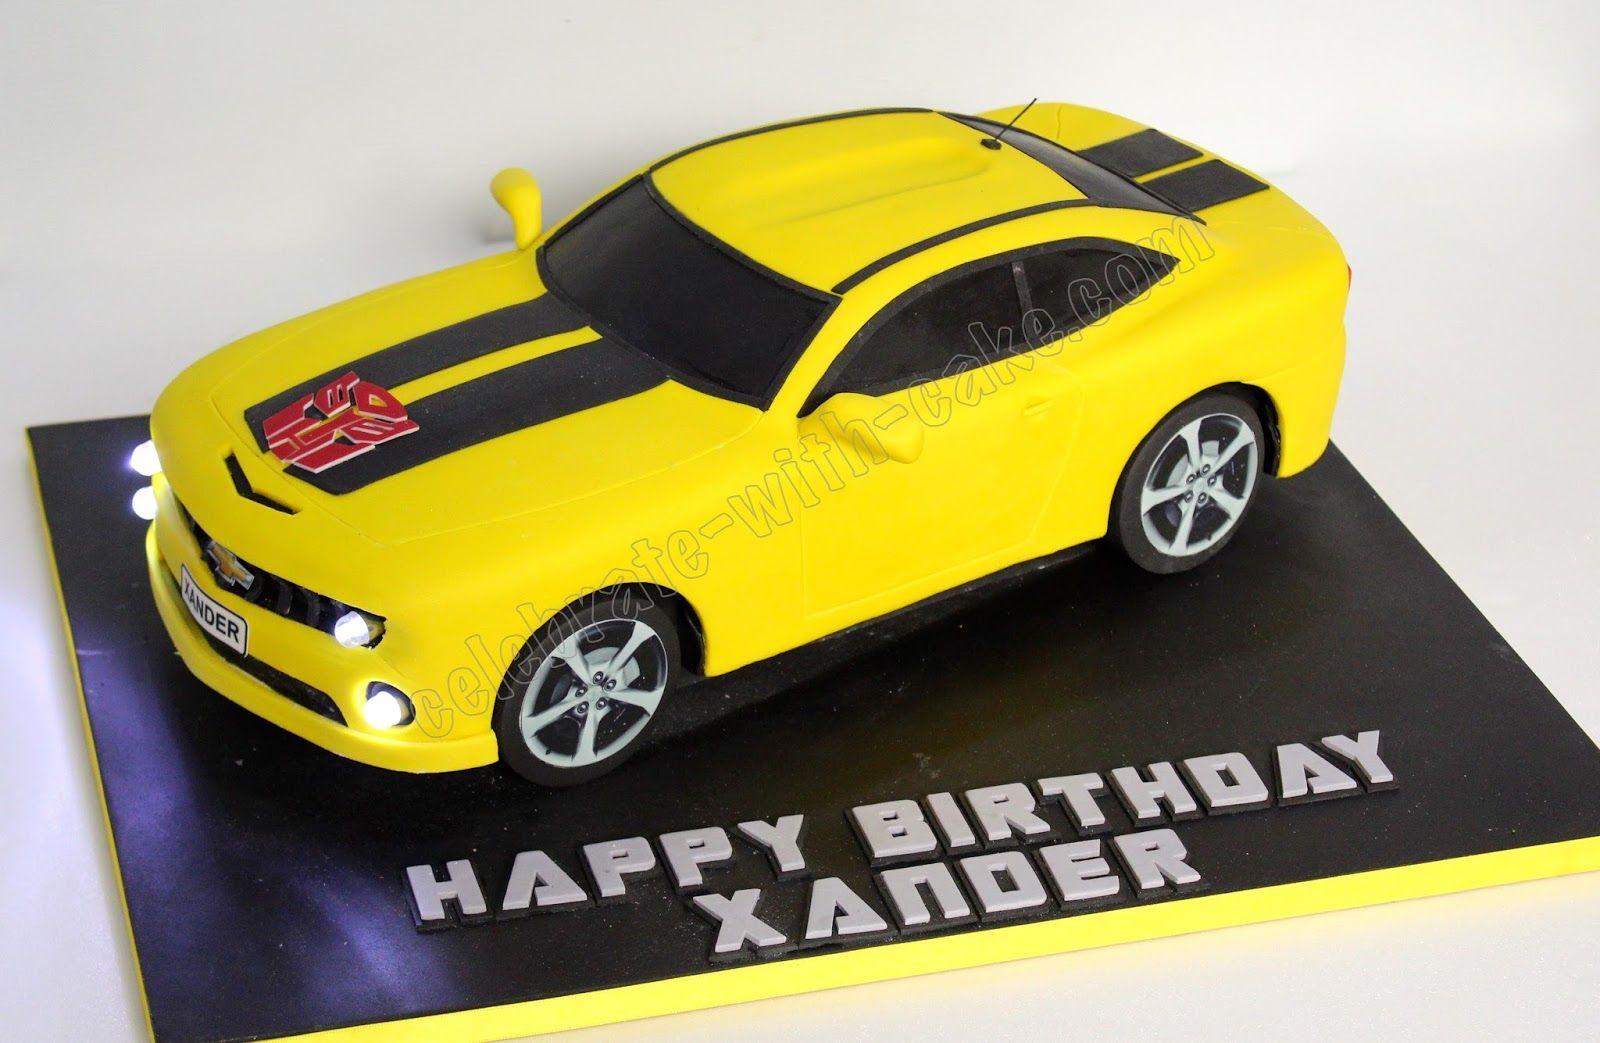 Bumble bee camaro cake 6th birthday cakes birthday cake